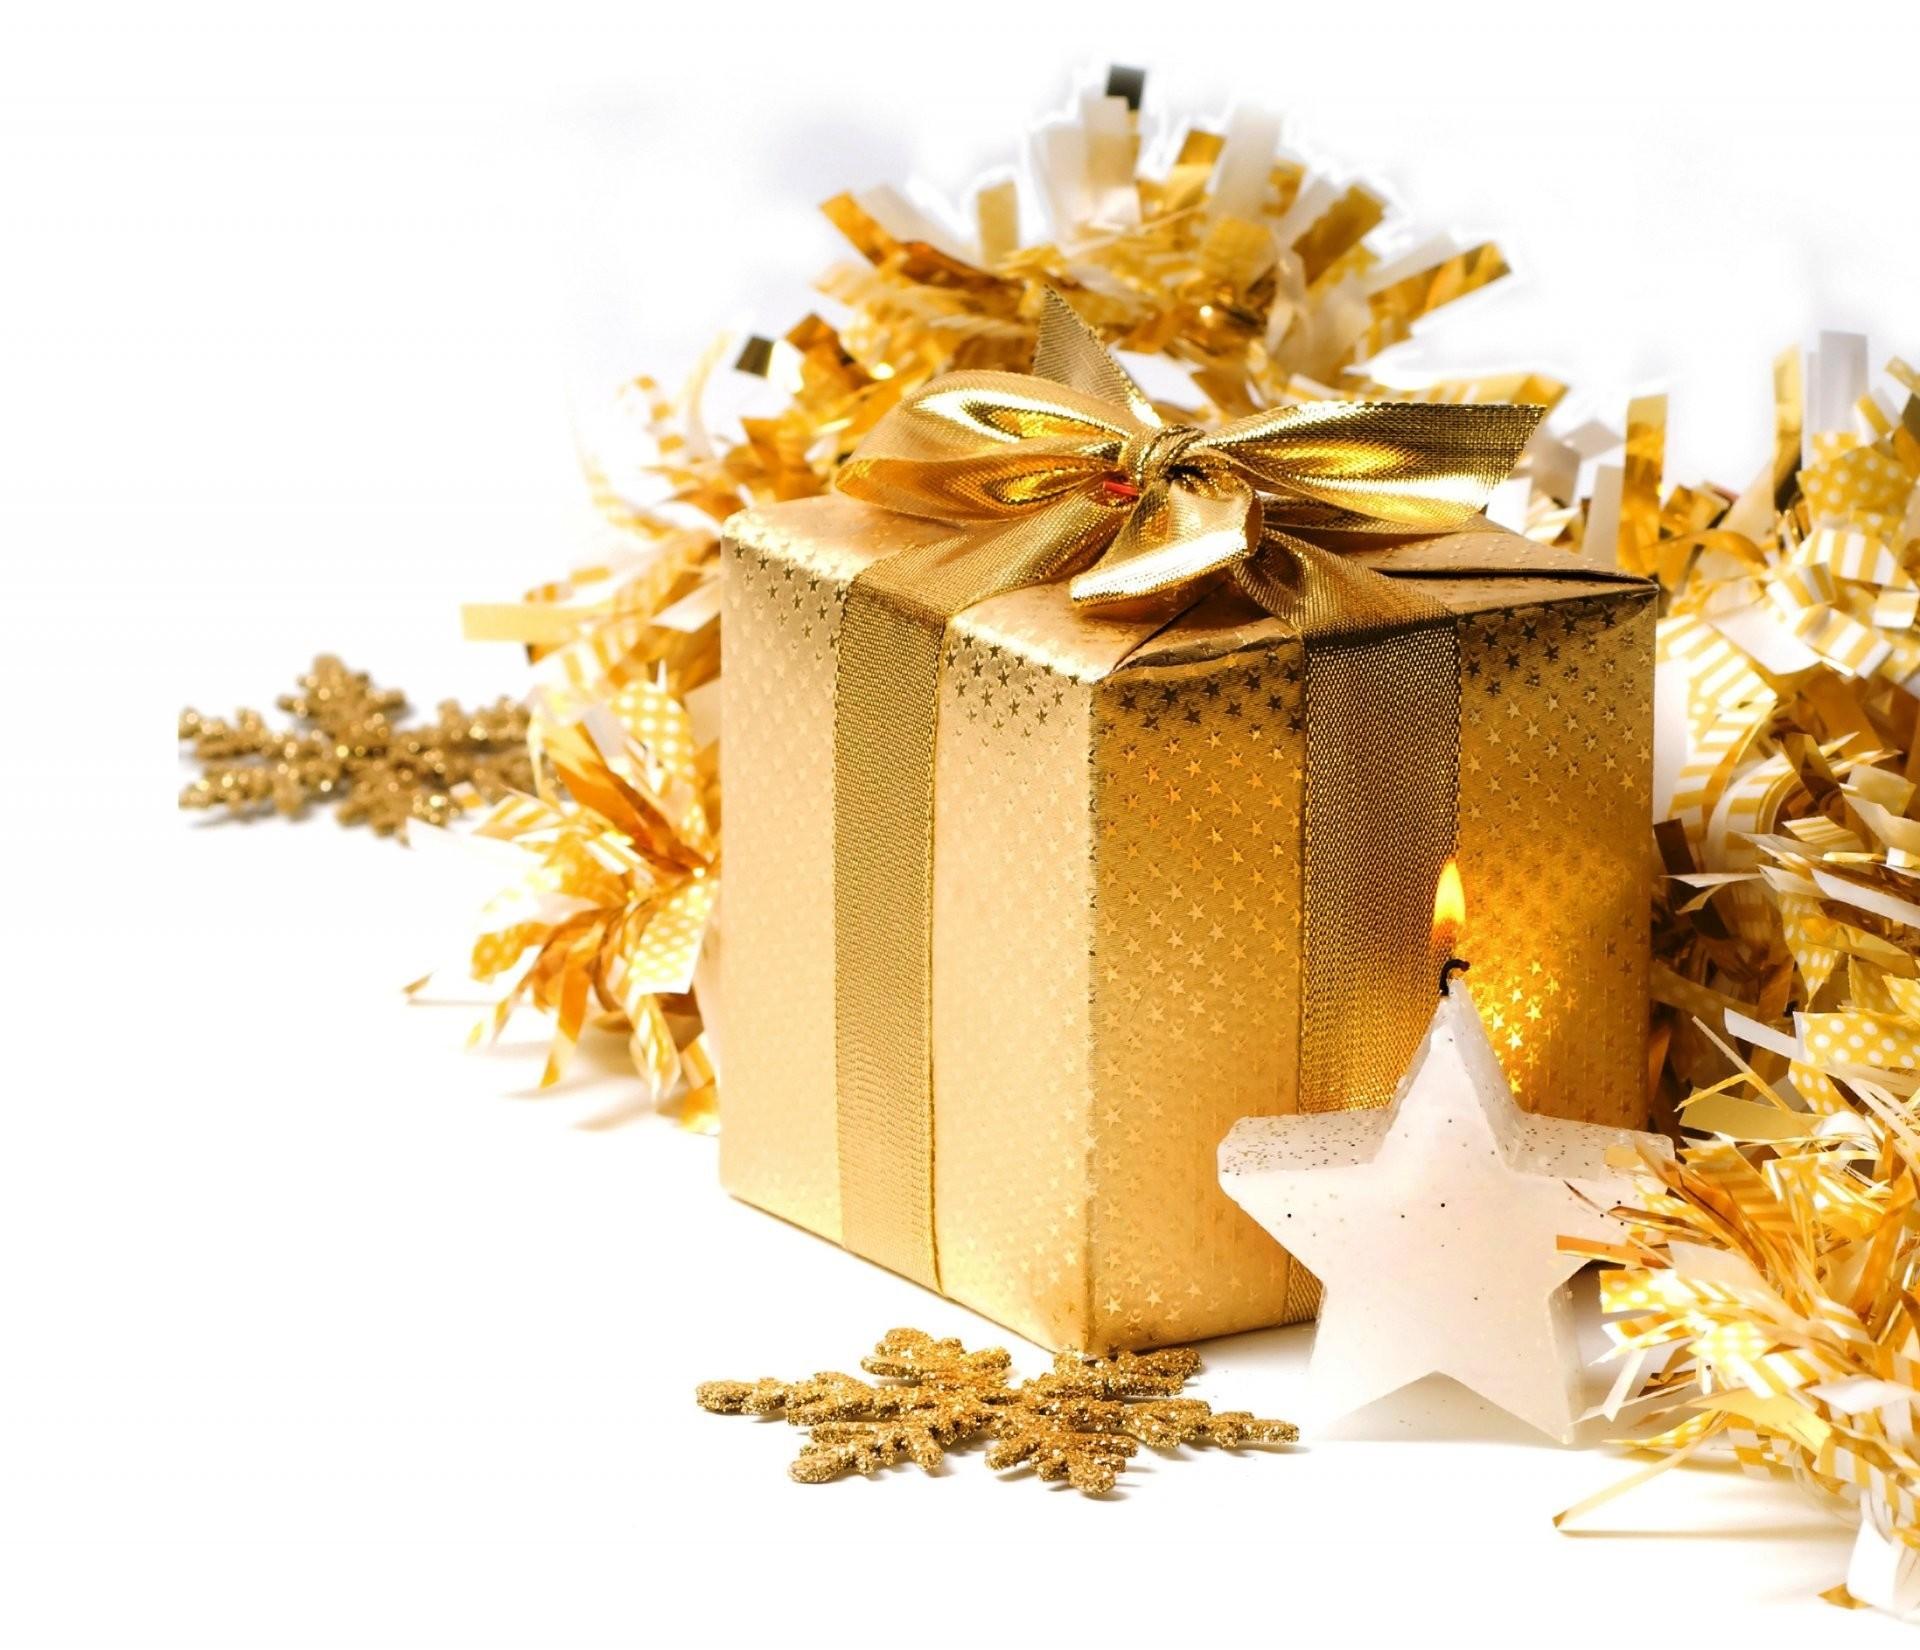 golden xmas merry christmas gift box decoration christmas new year present  gold decoration snowflakes